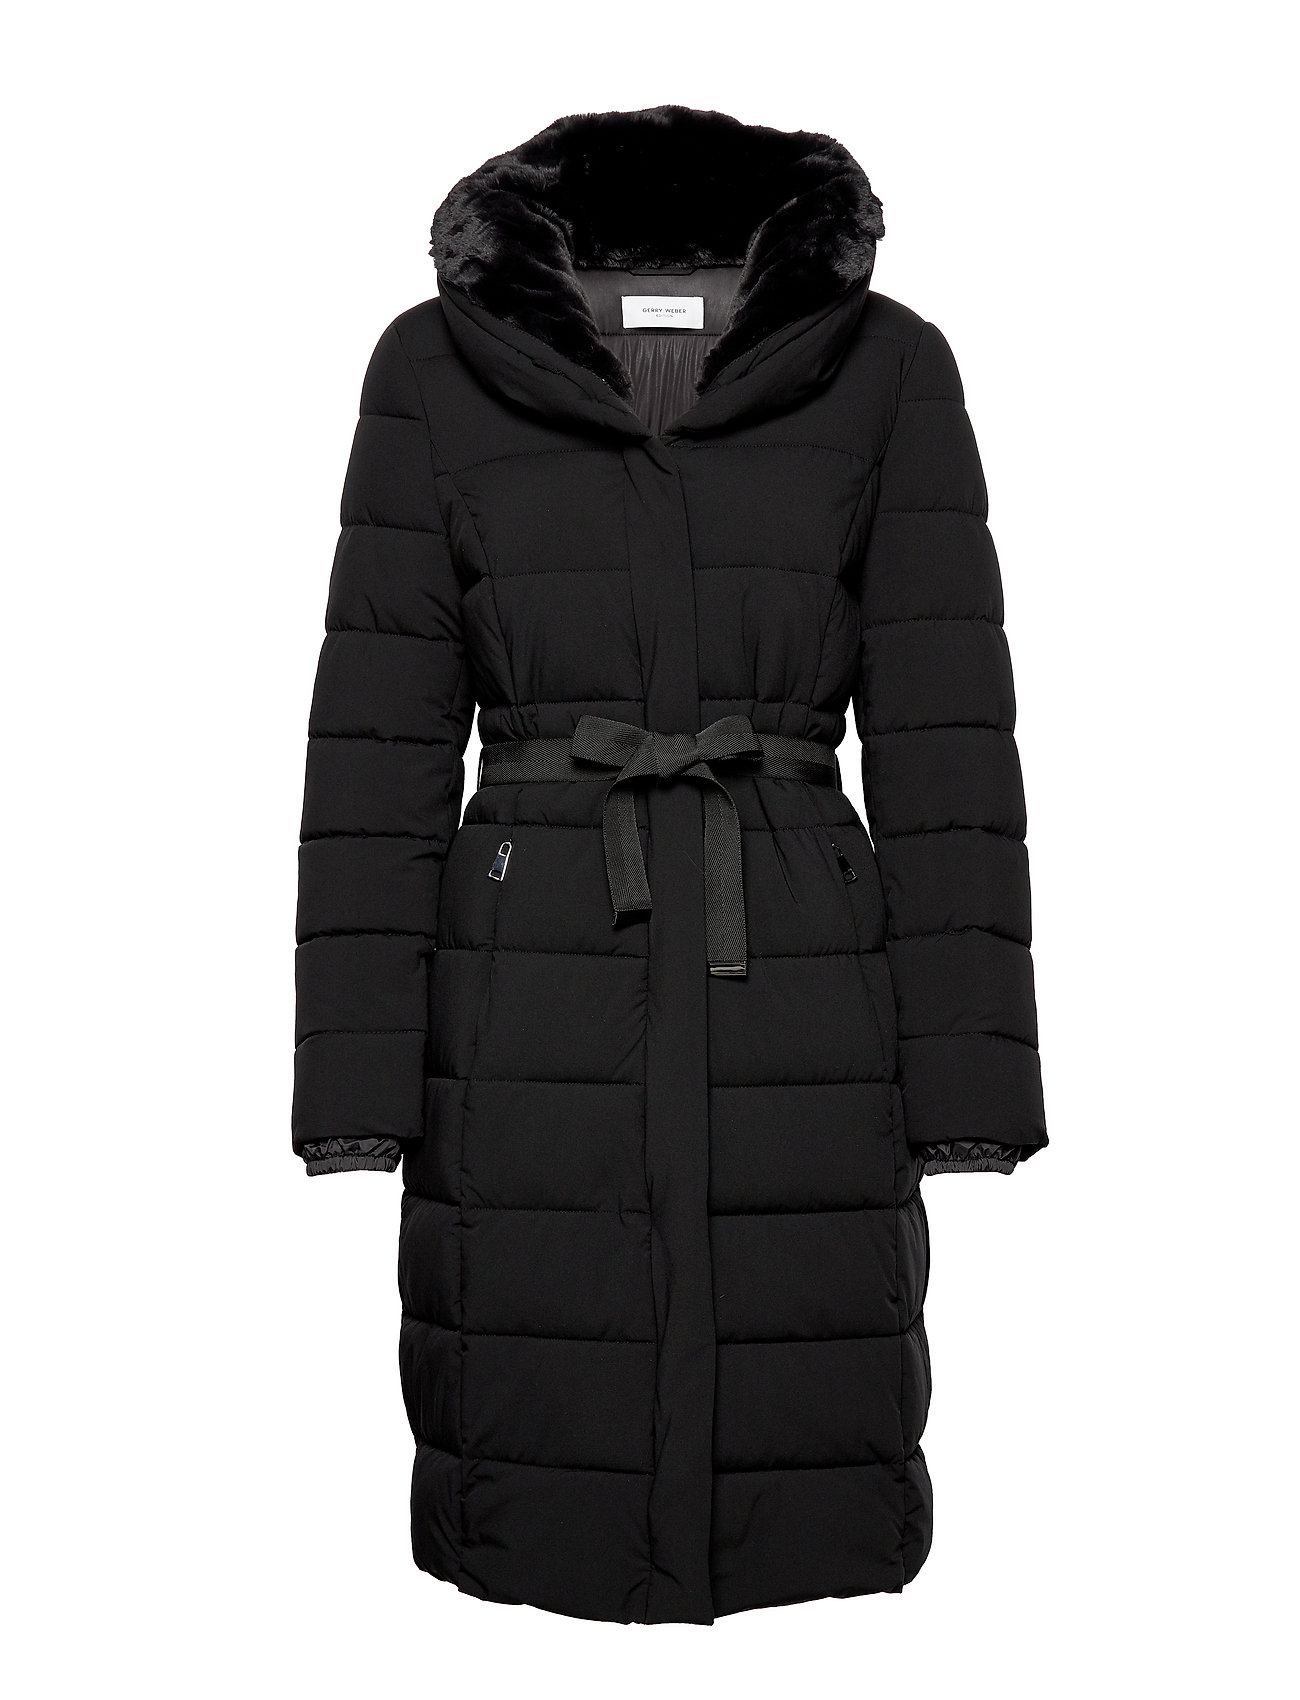 Gerry Weber Edition COAT NOT WOOL - BLACK